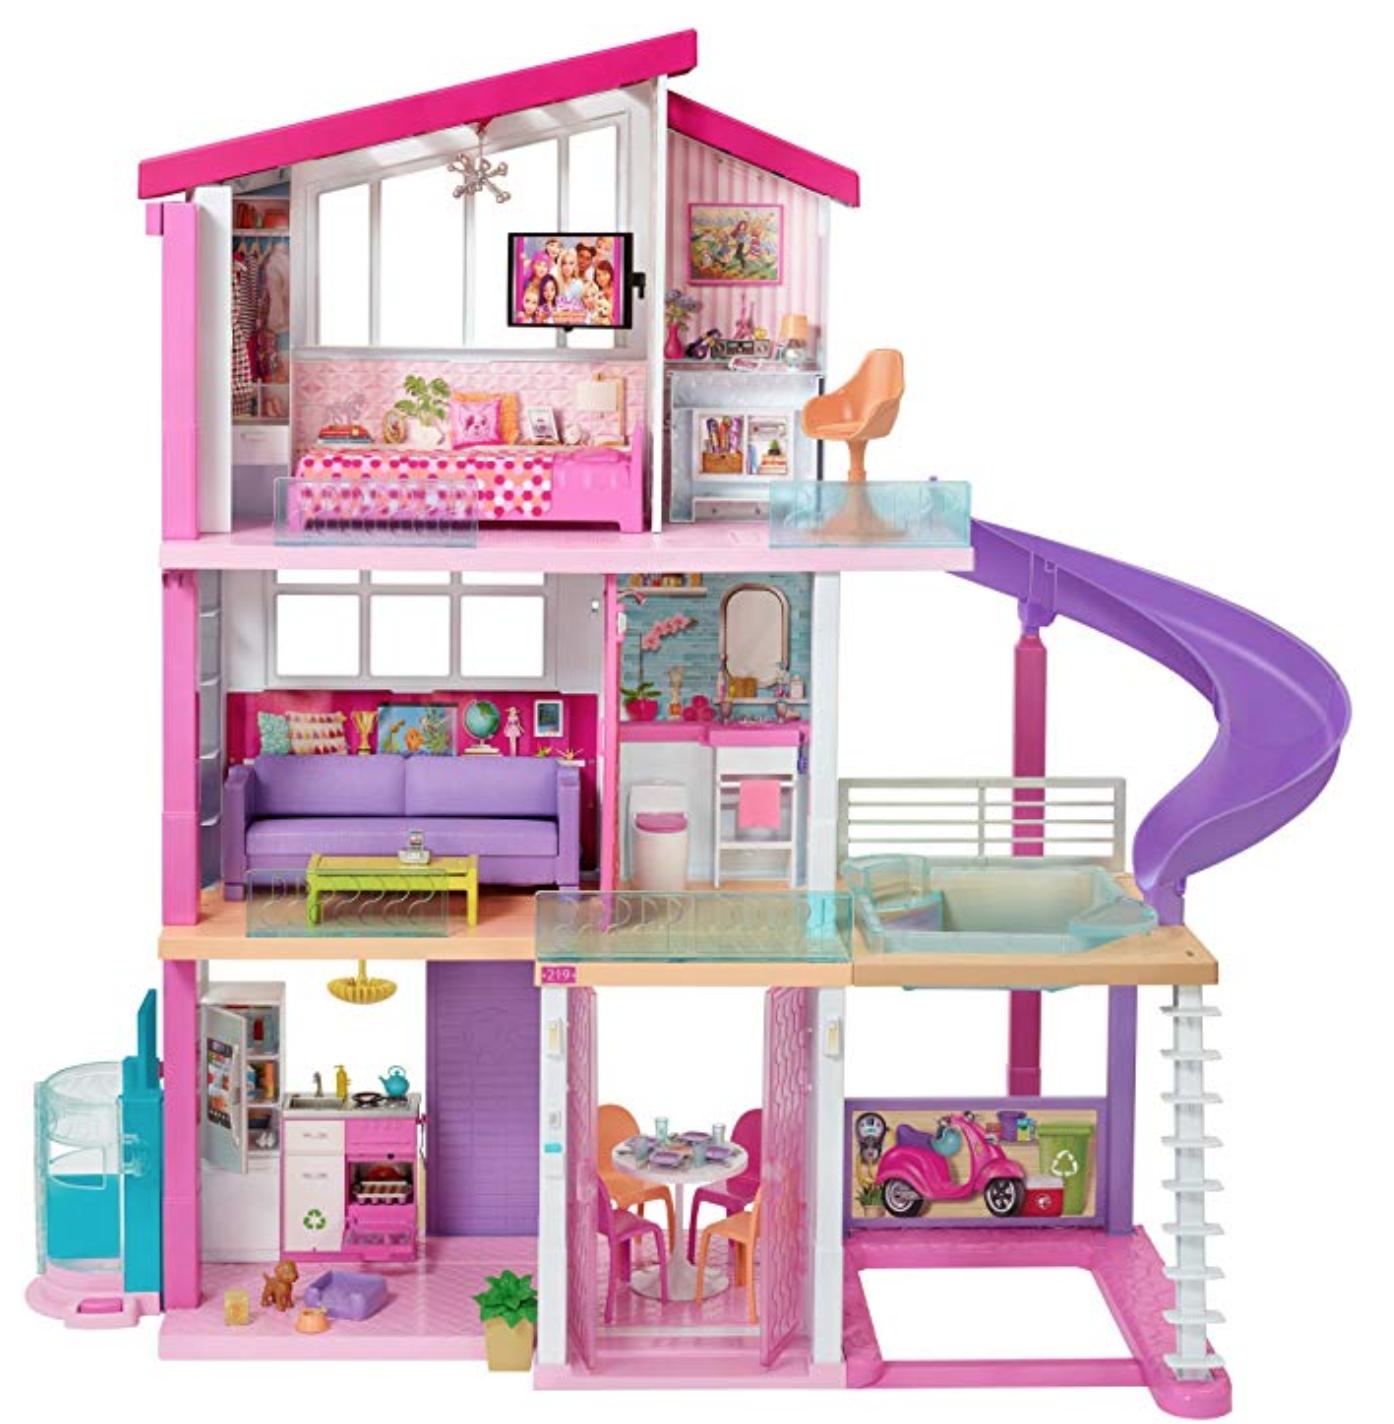 BarbieDreamhouse